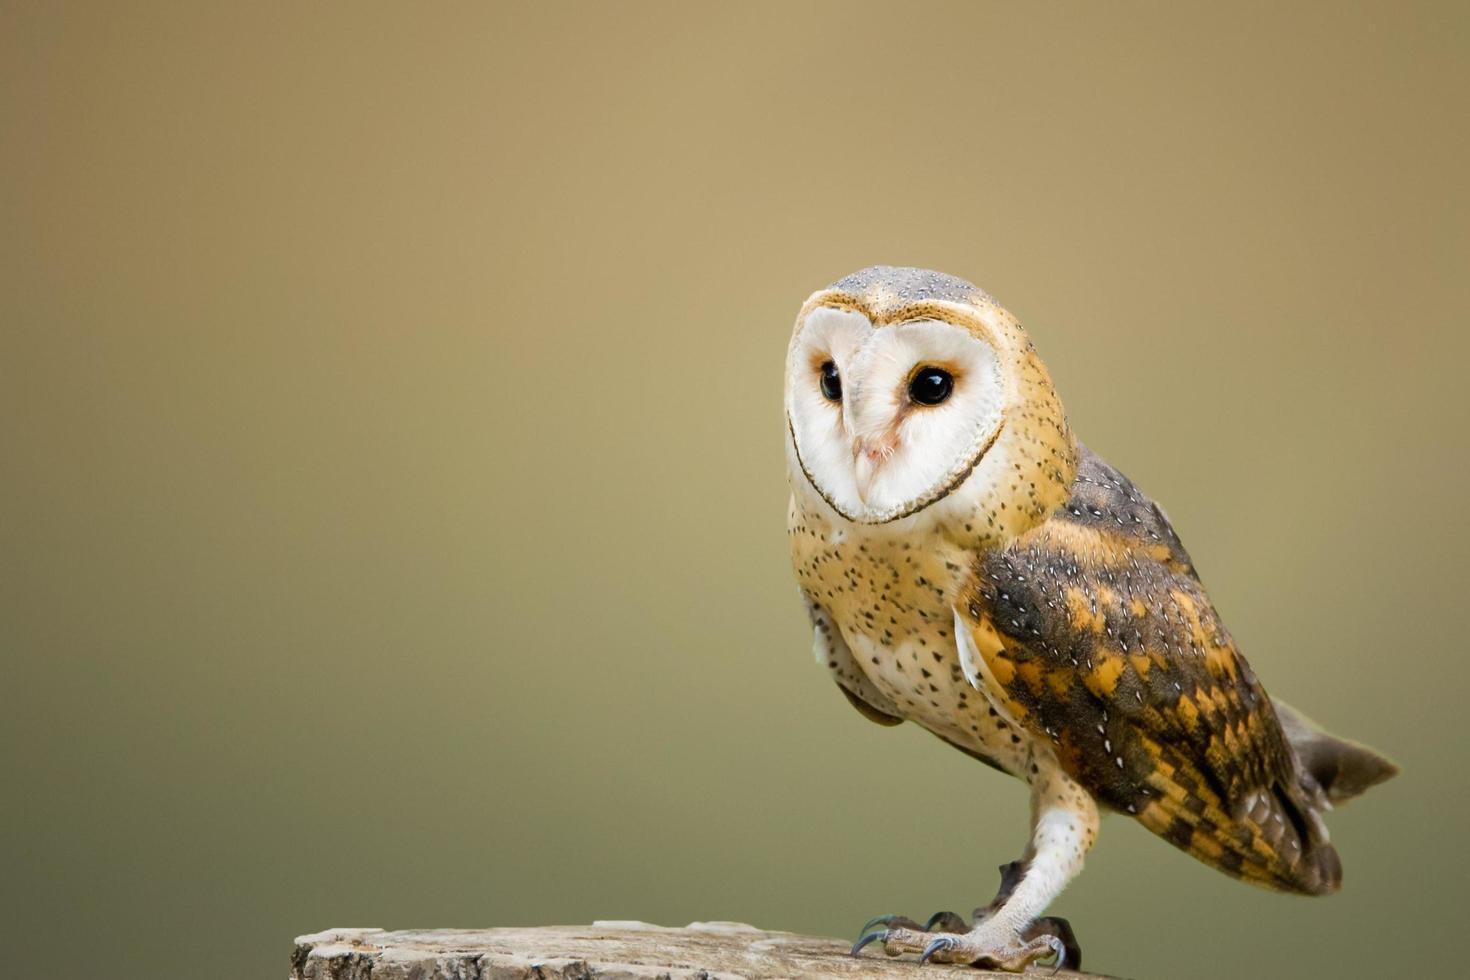 Brown owl on top of tree log photo